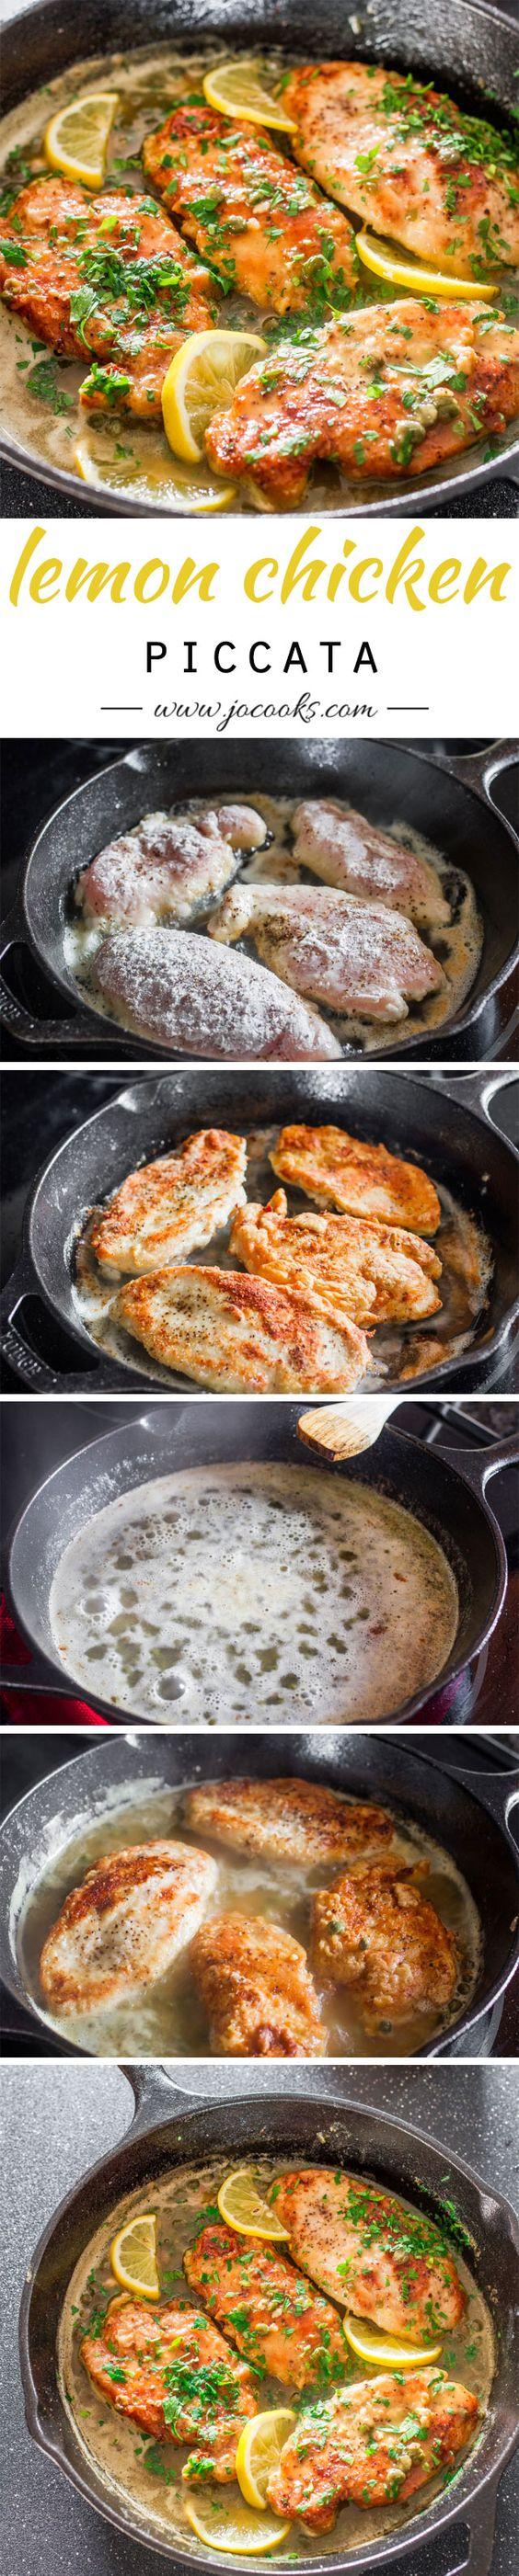 Lemon Chicken Piccata #chicken #foodporn #dan330 http://livedan330.com/2015/02/28/lemon-chicken-piccata/